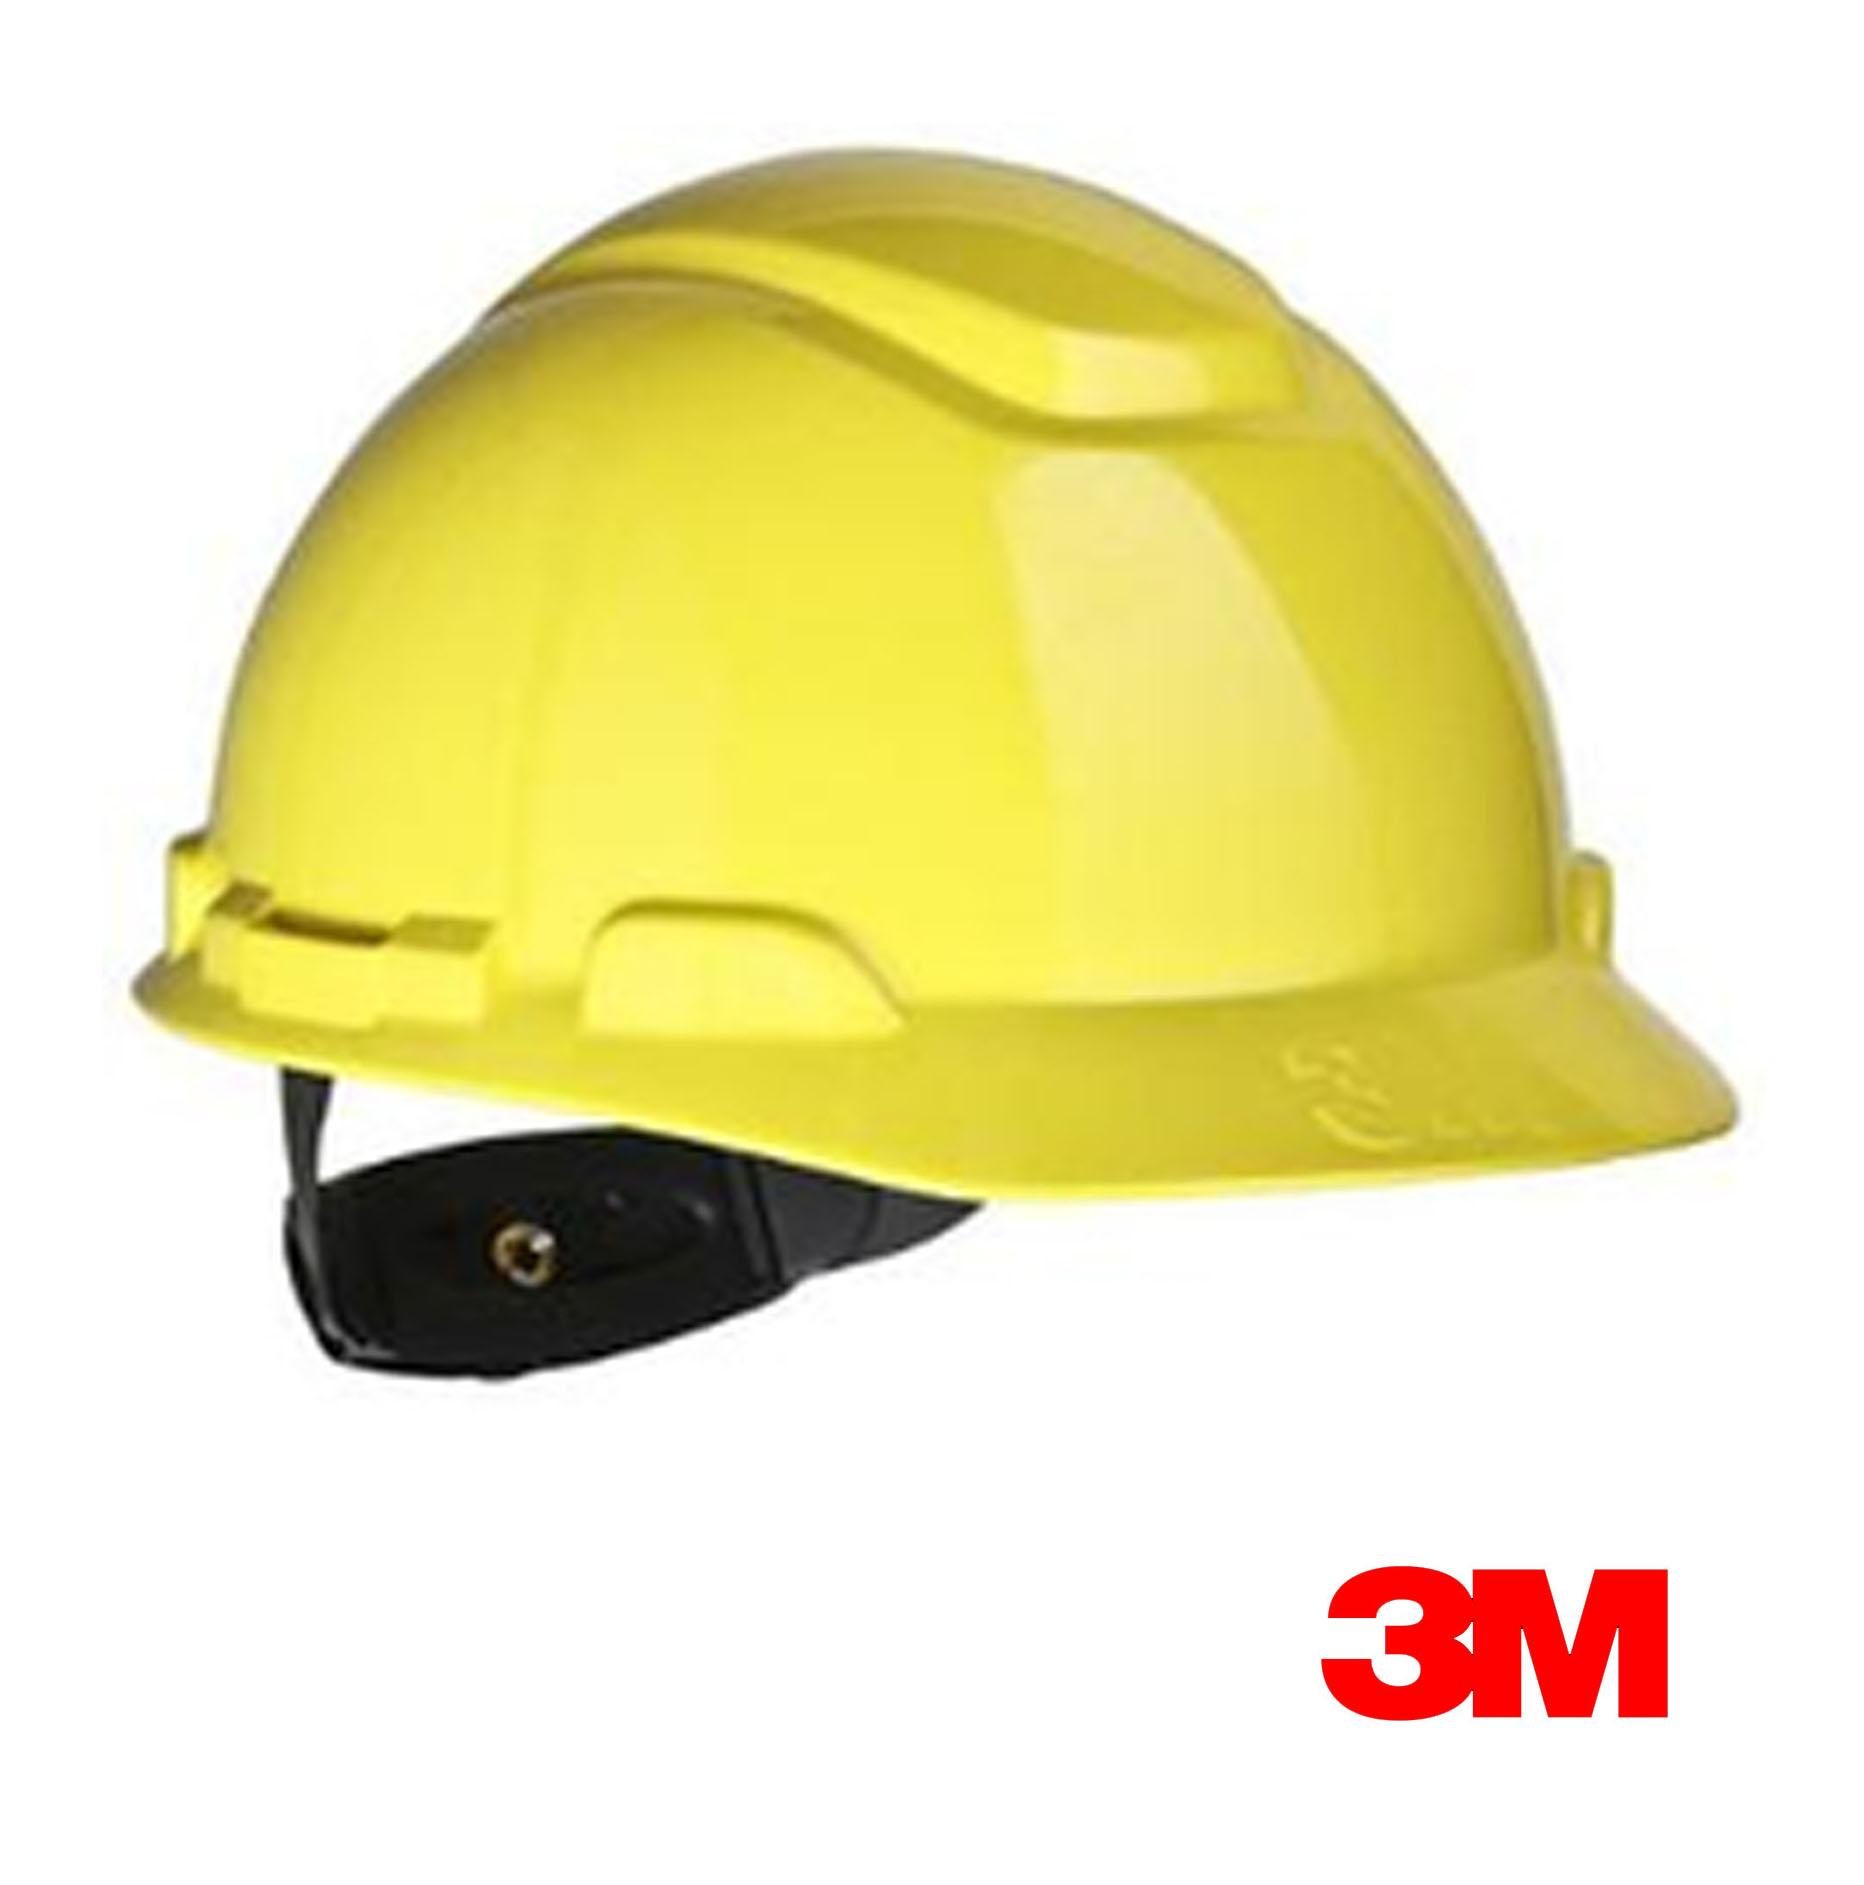 Casco de seguridad 3M serie H-700